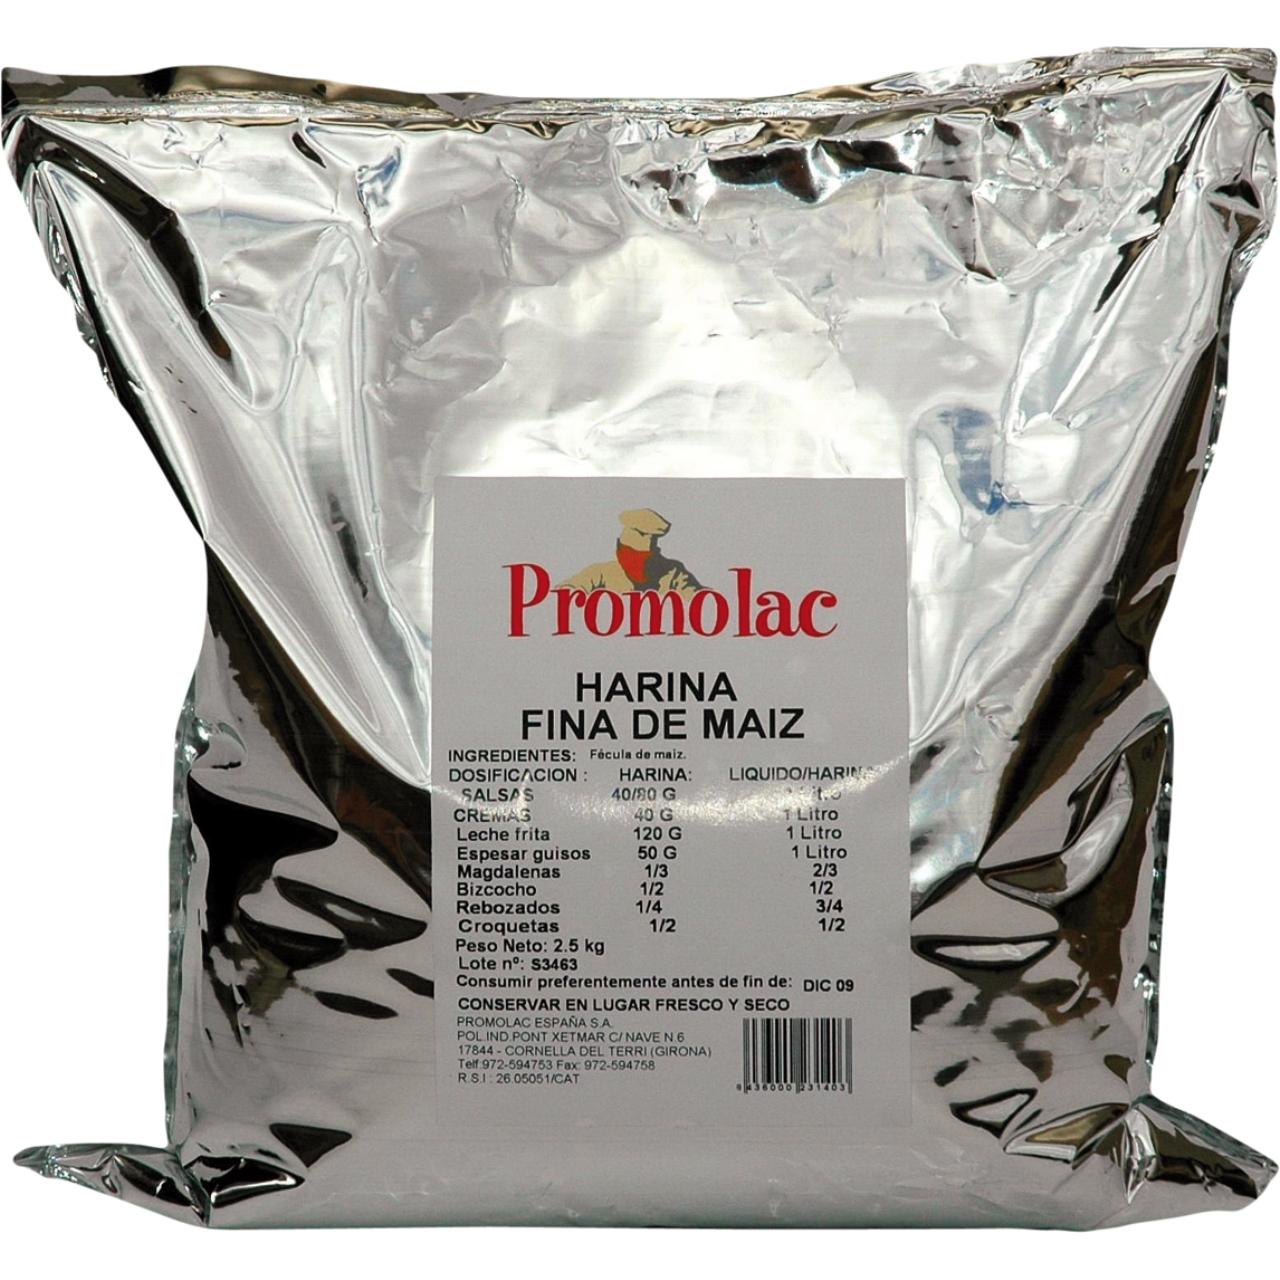 Harina fina maíz 2,5kg. Promolac